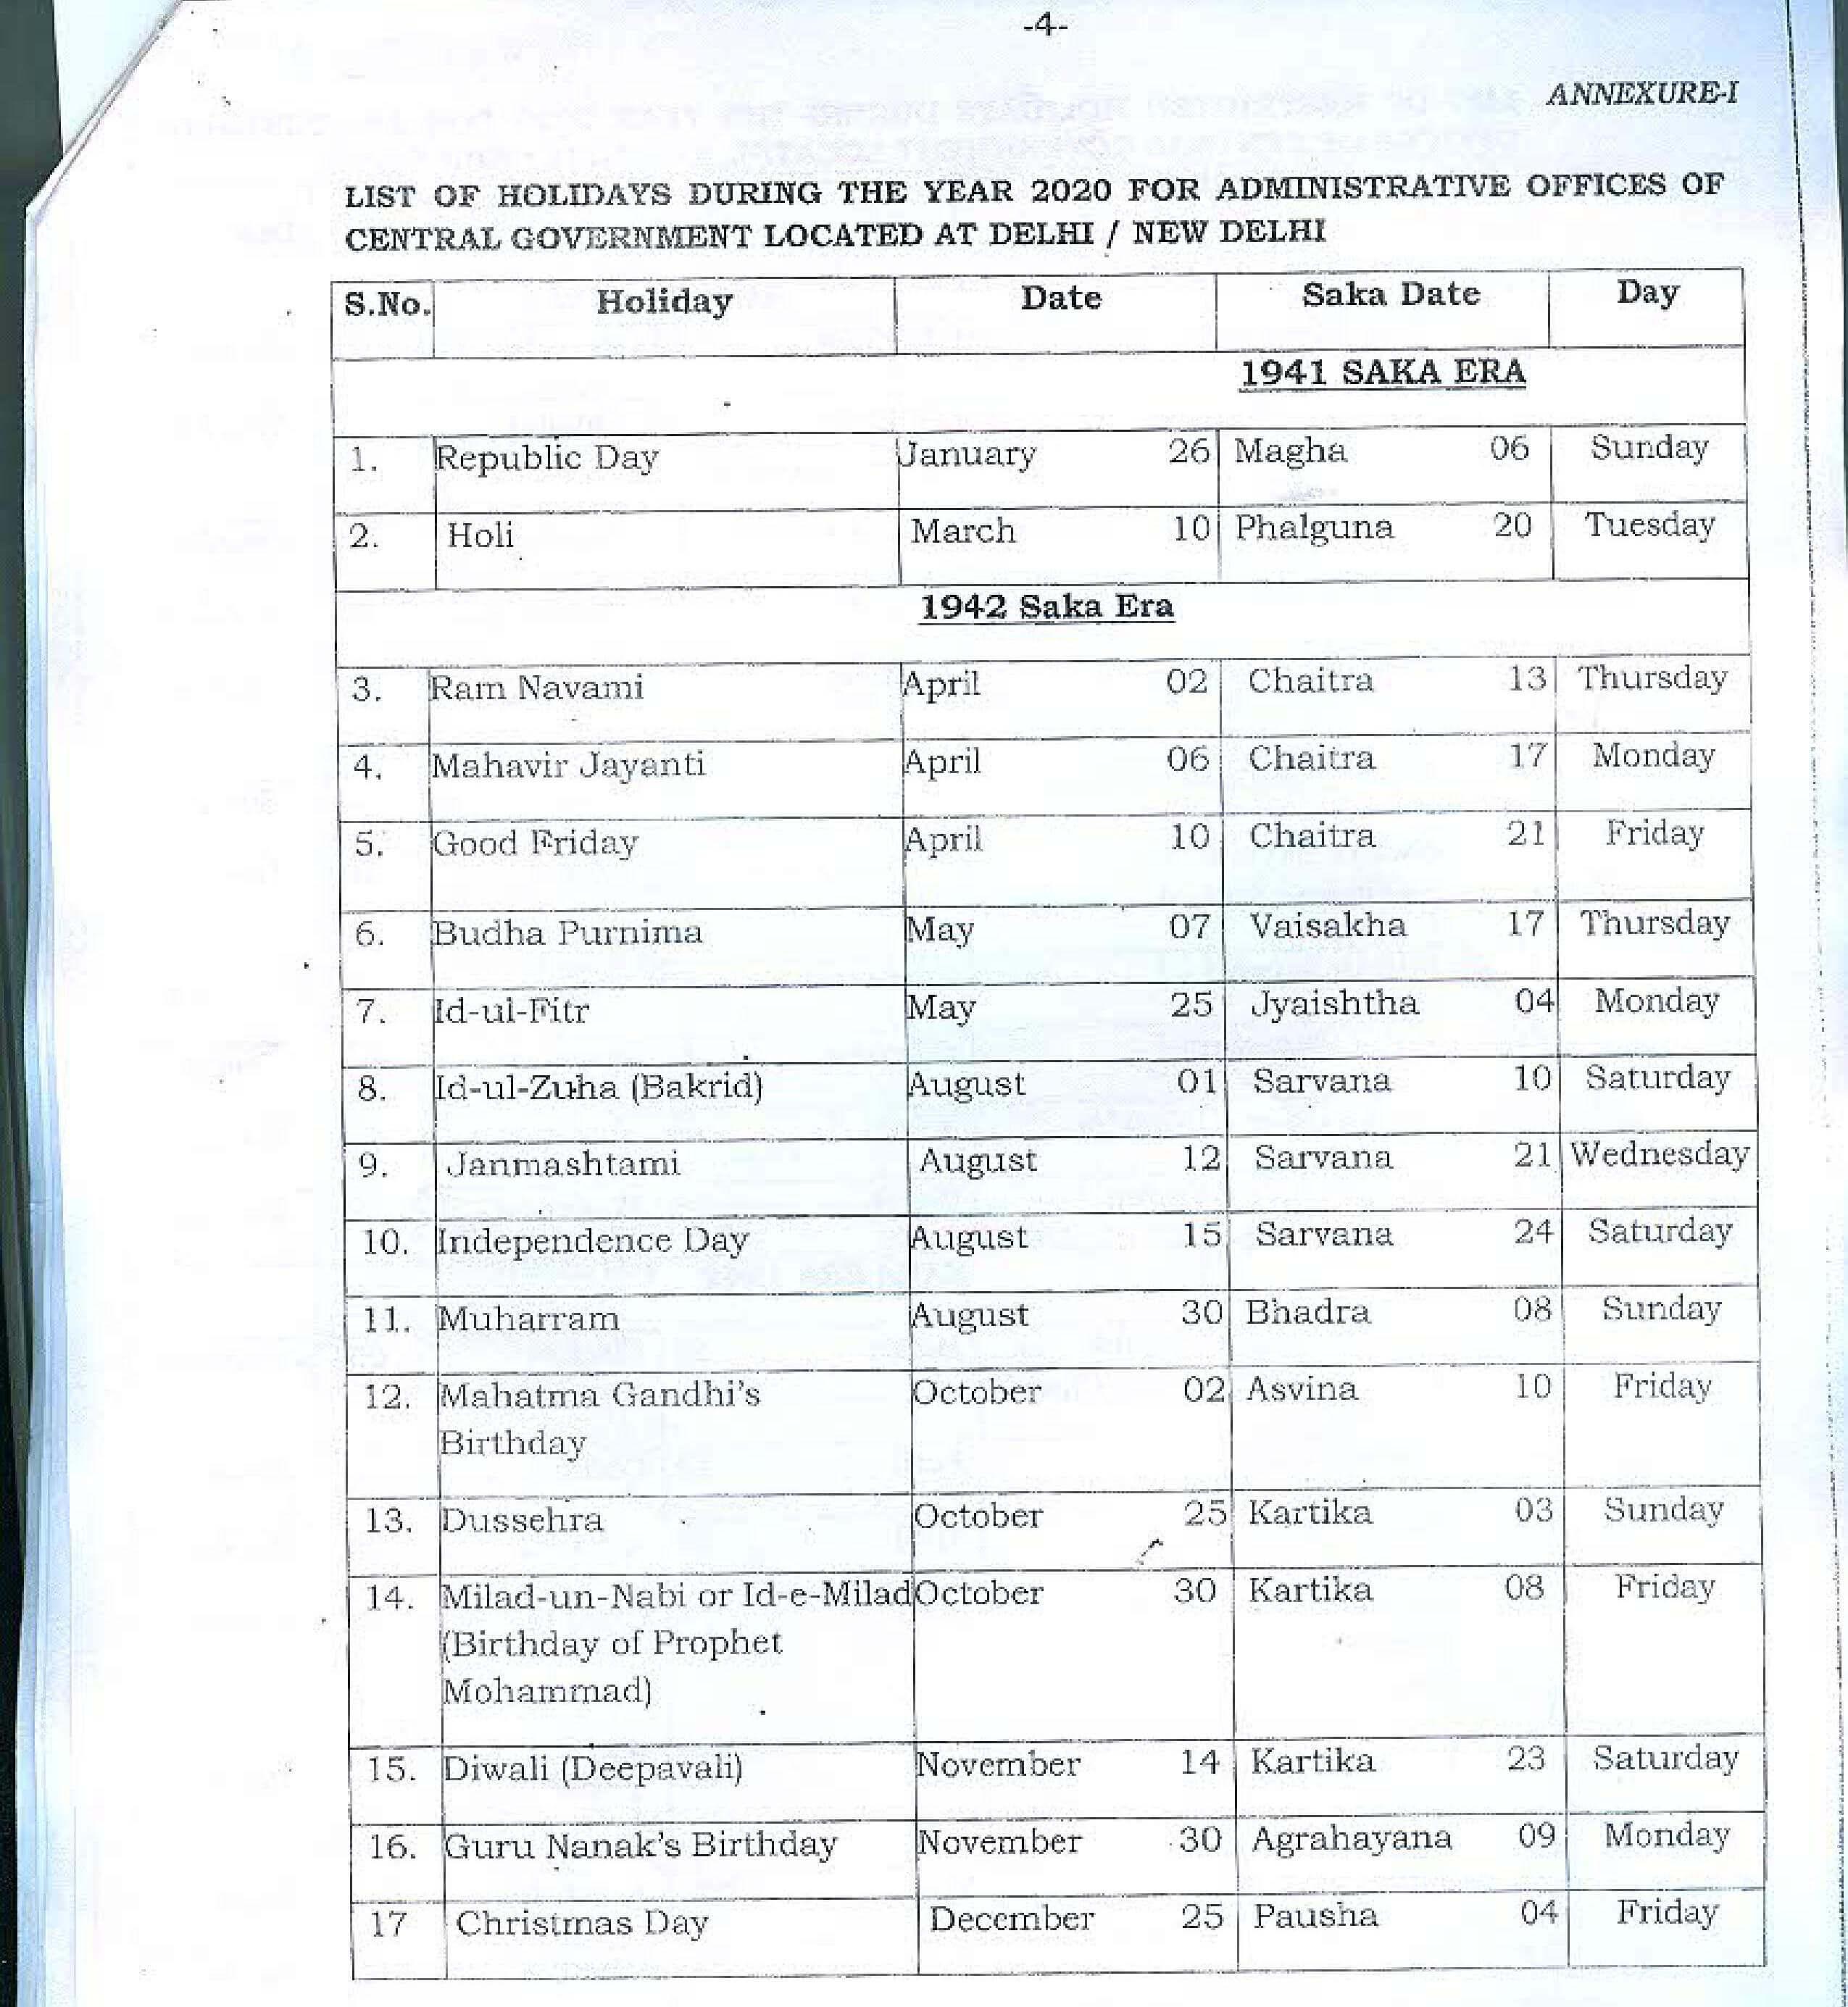 Bsnl Holidays List 2020 | Gazetted And Restricted Holidays inside Government Calendar 2020 Bihar